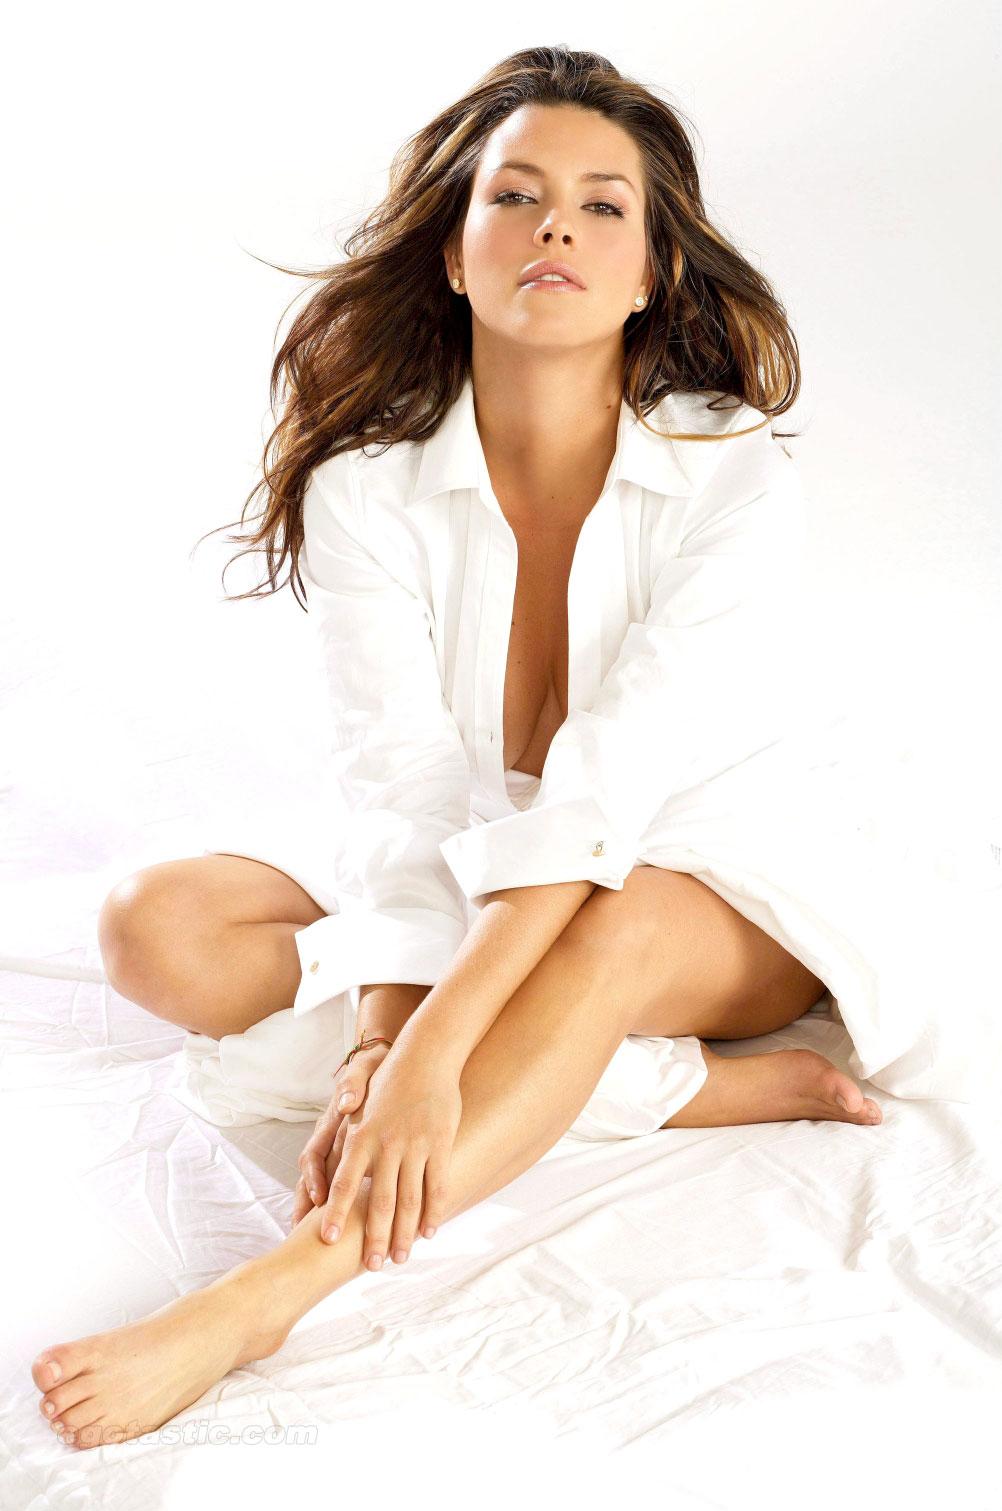 incredibly hot nude girl